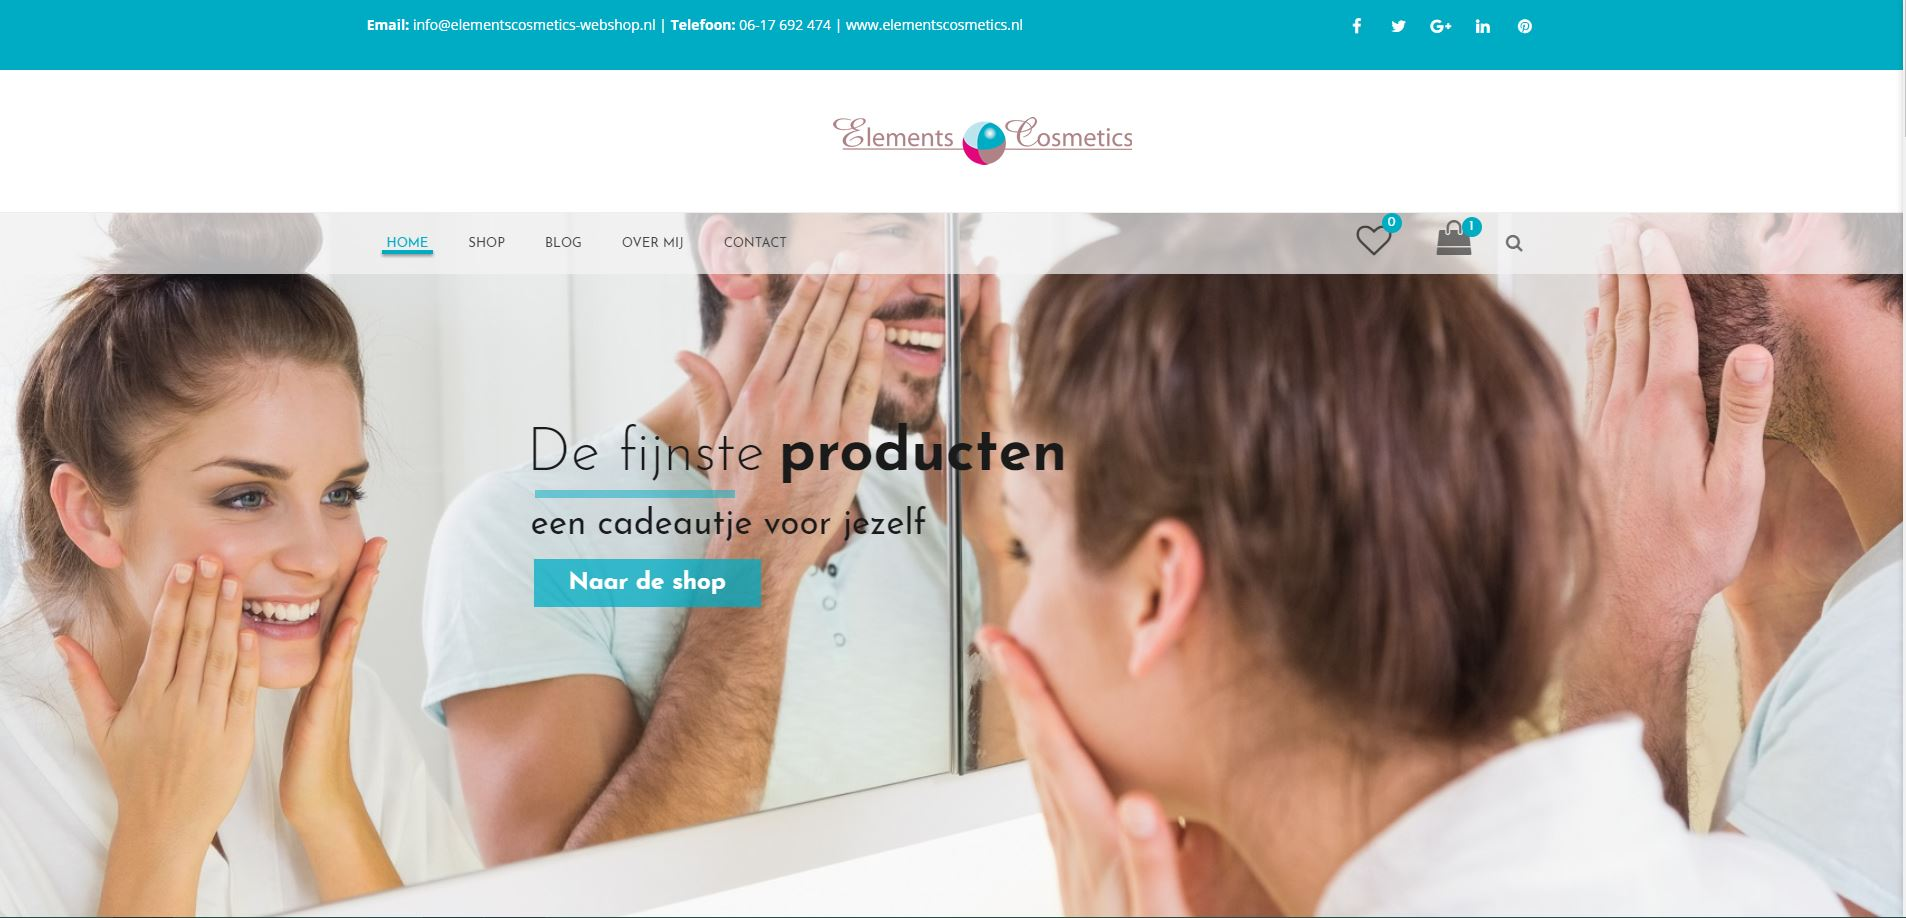 elements cosmetics webshop in woocommerce